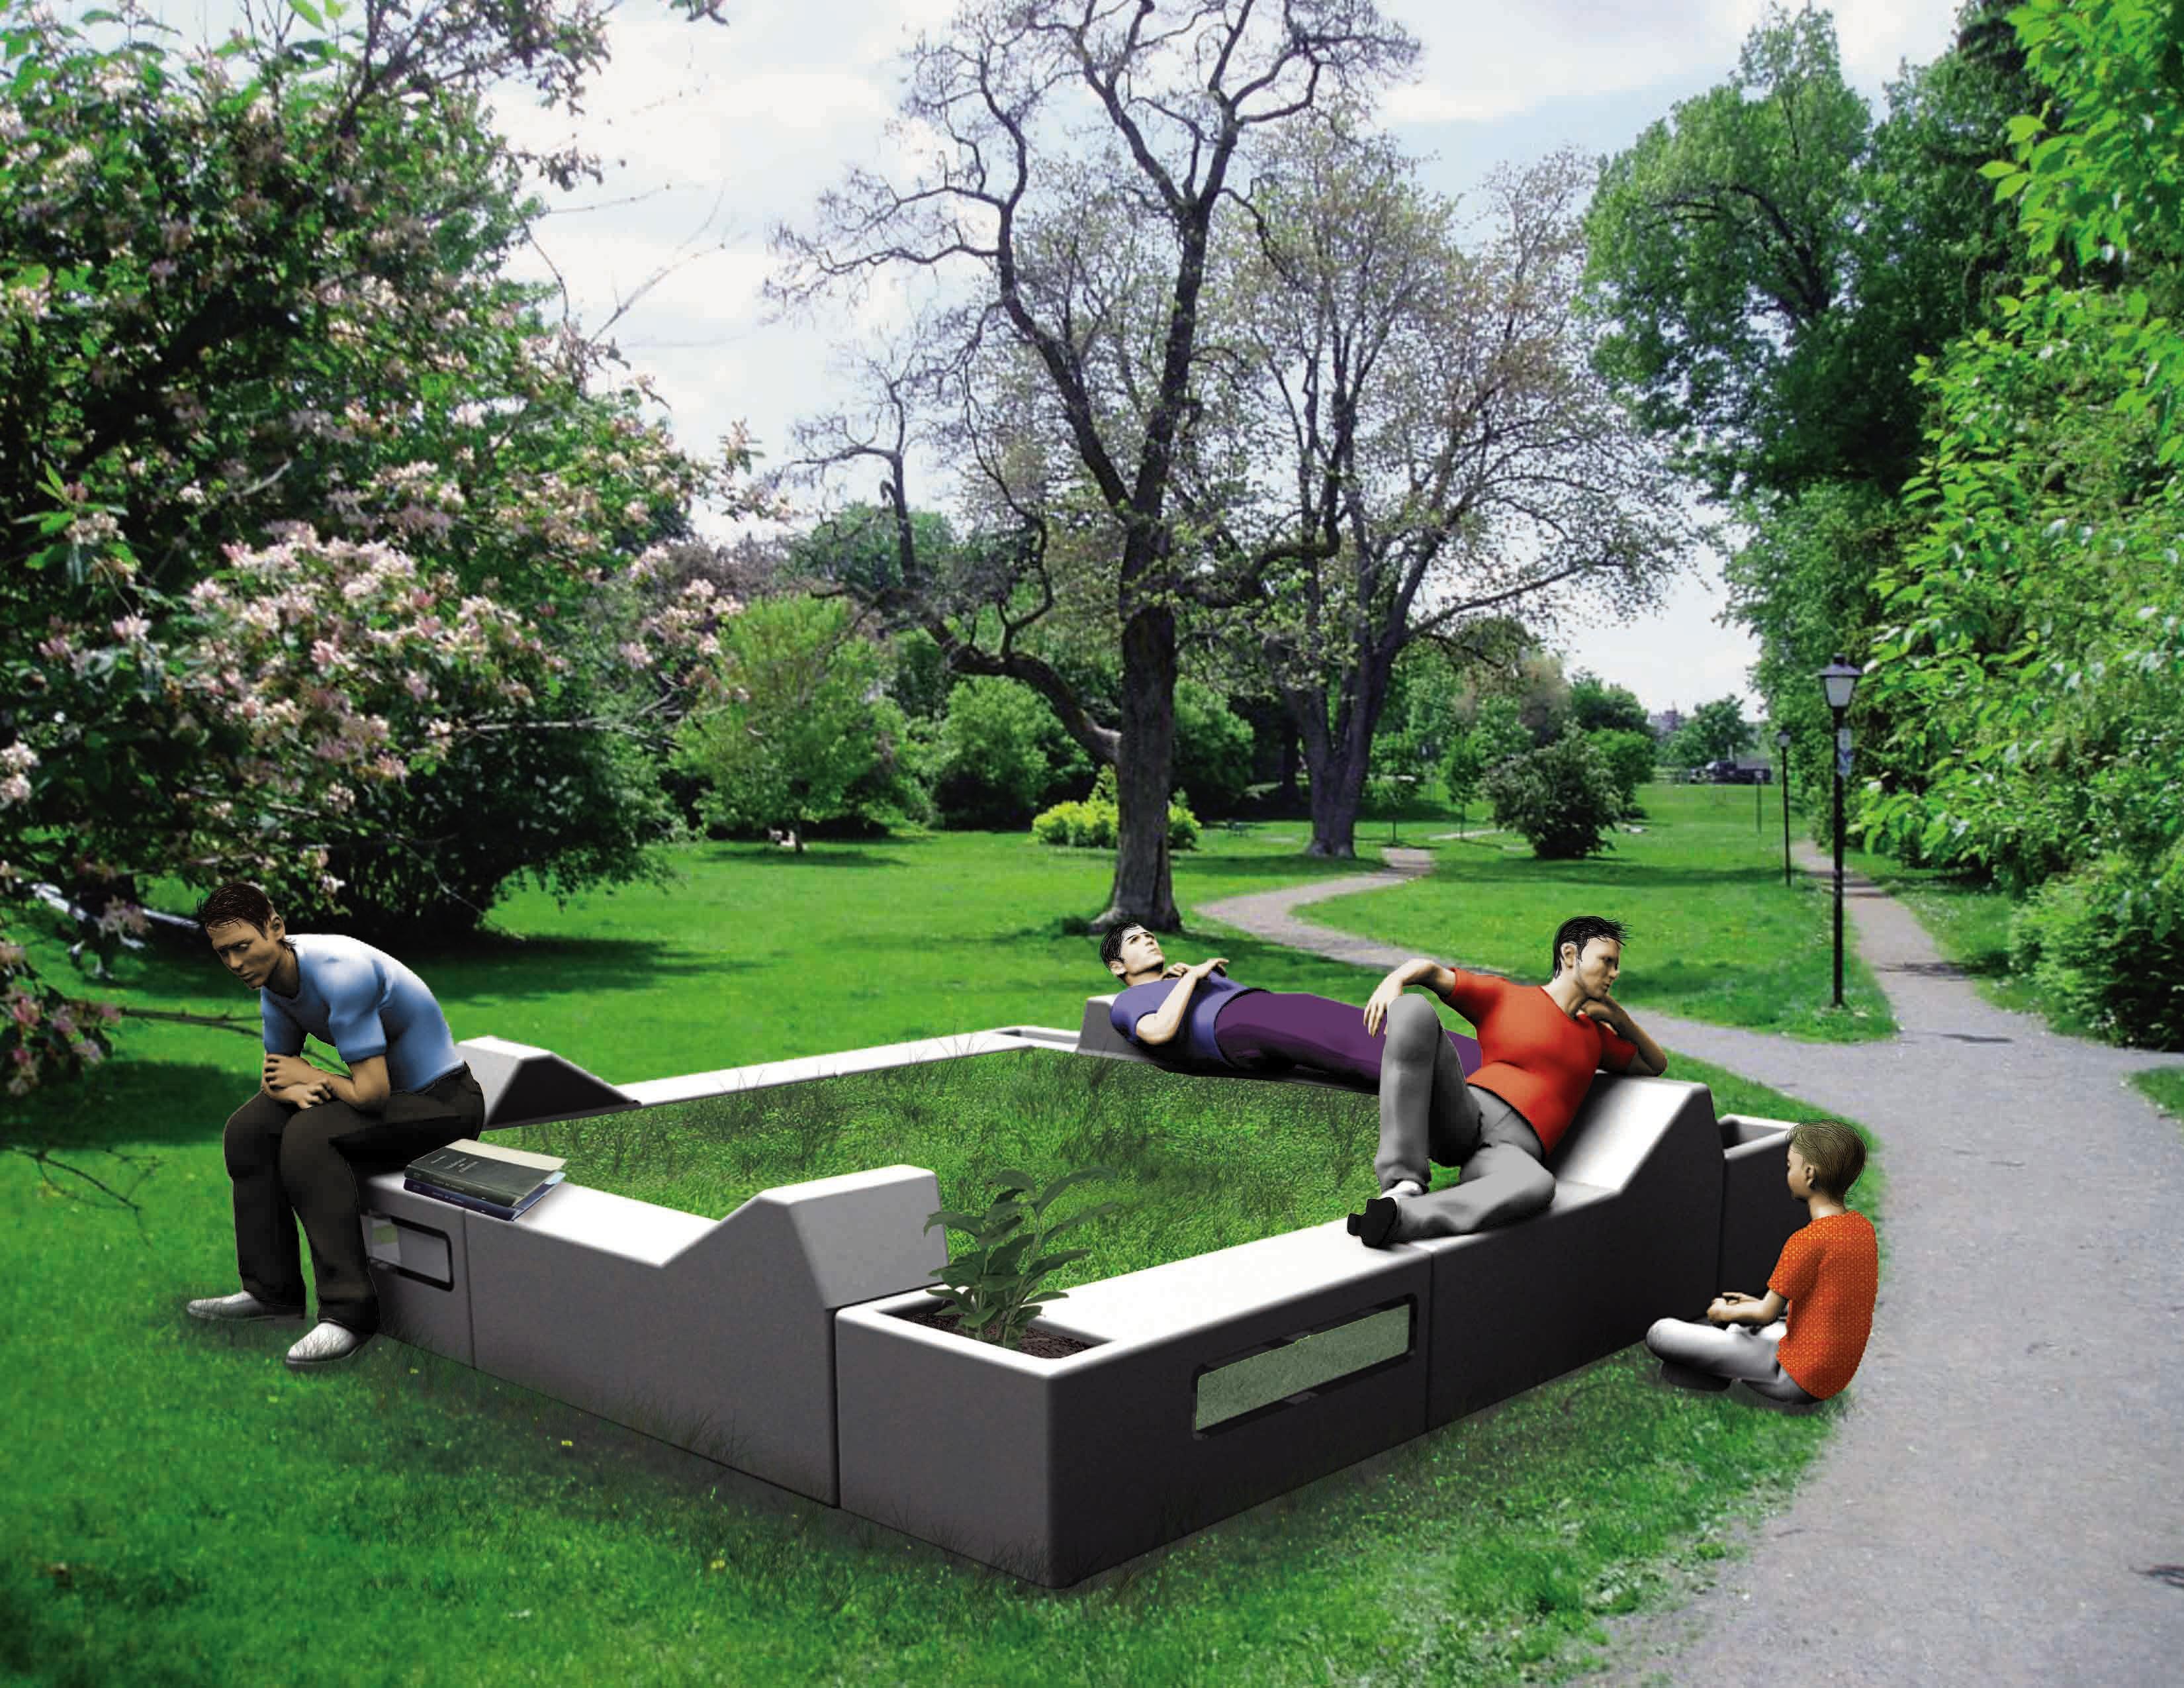 Urban Furniture Design new work 2010juan david giraldo castaño at coroflot